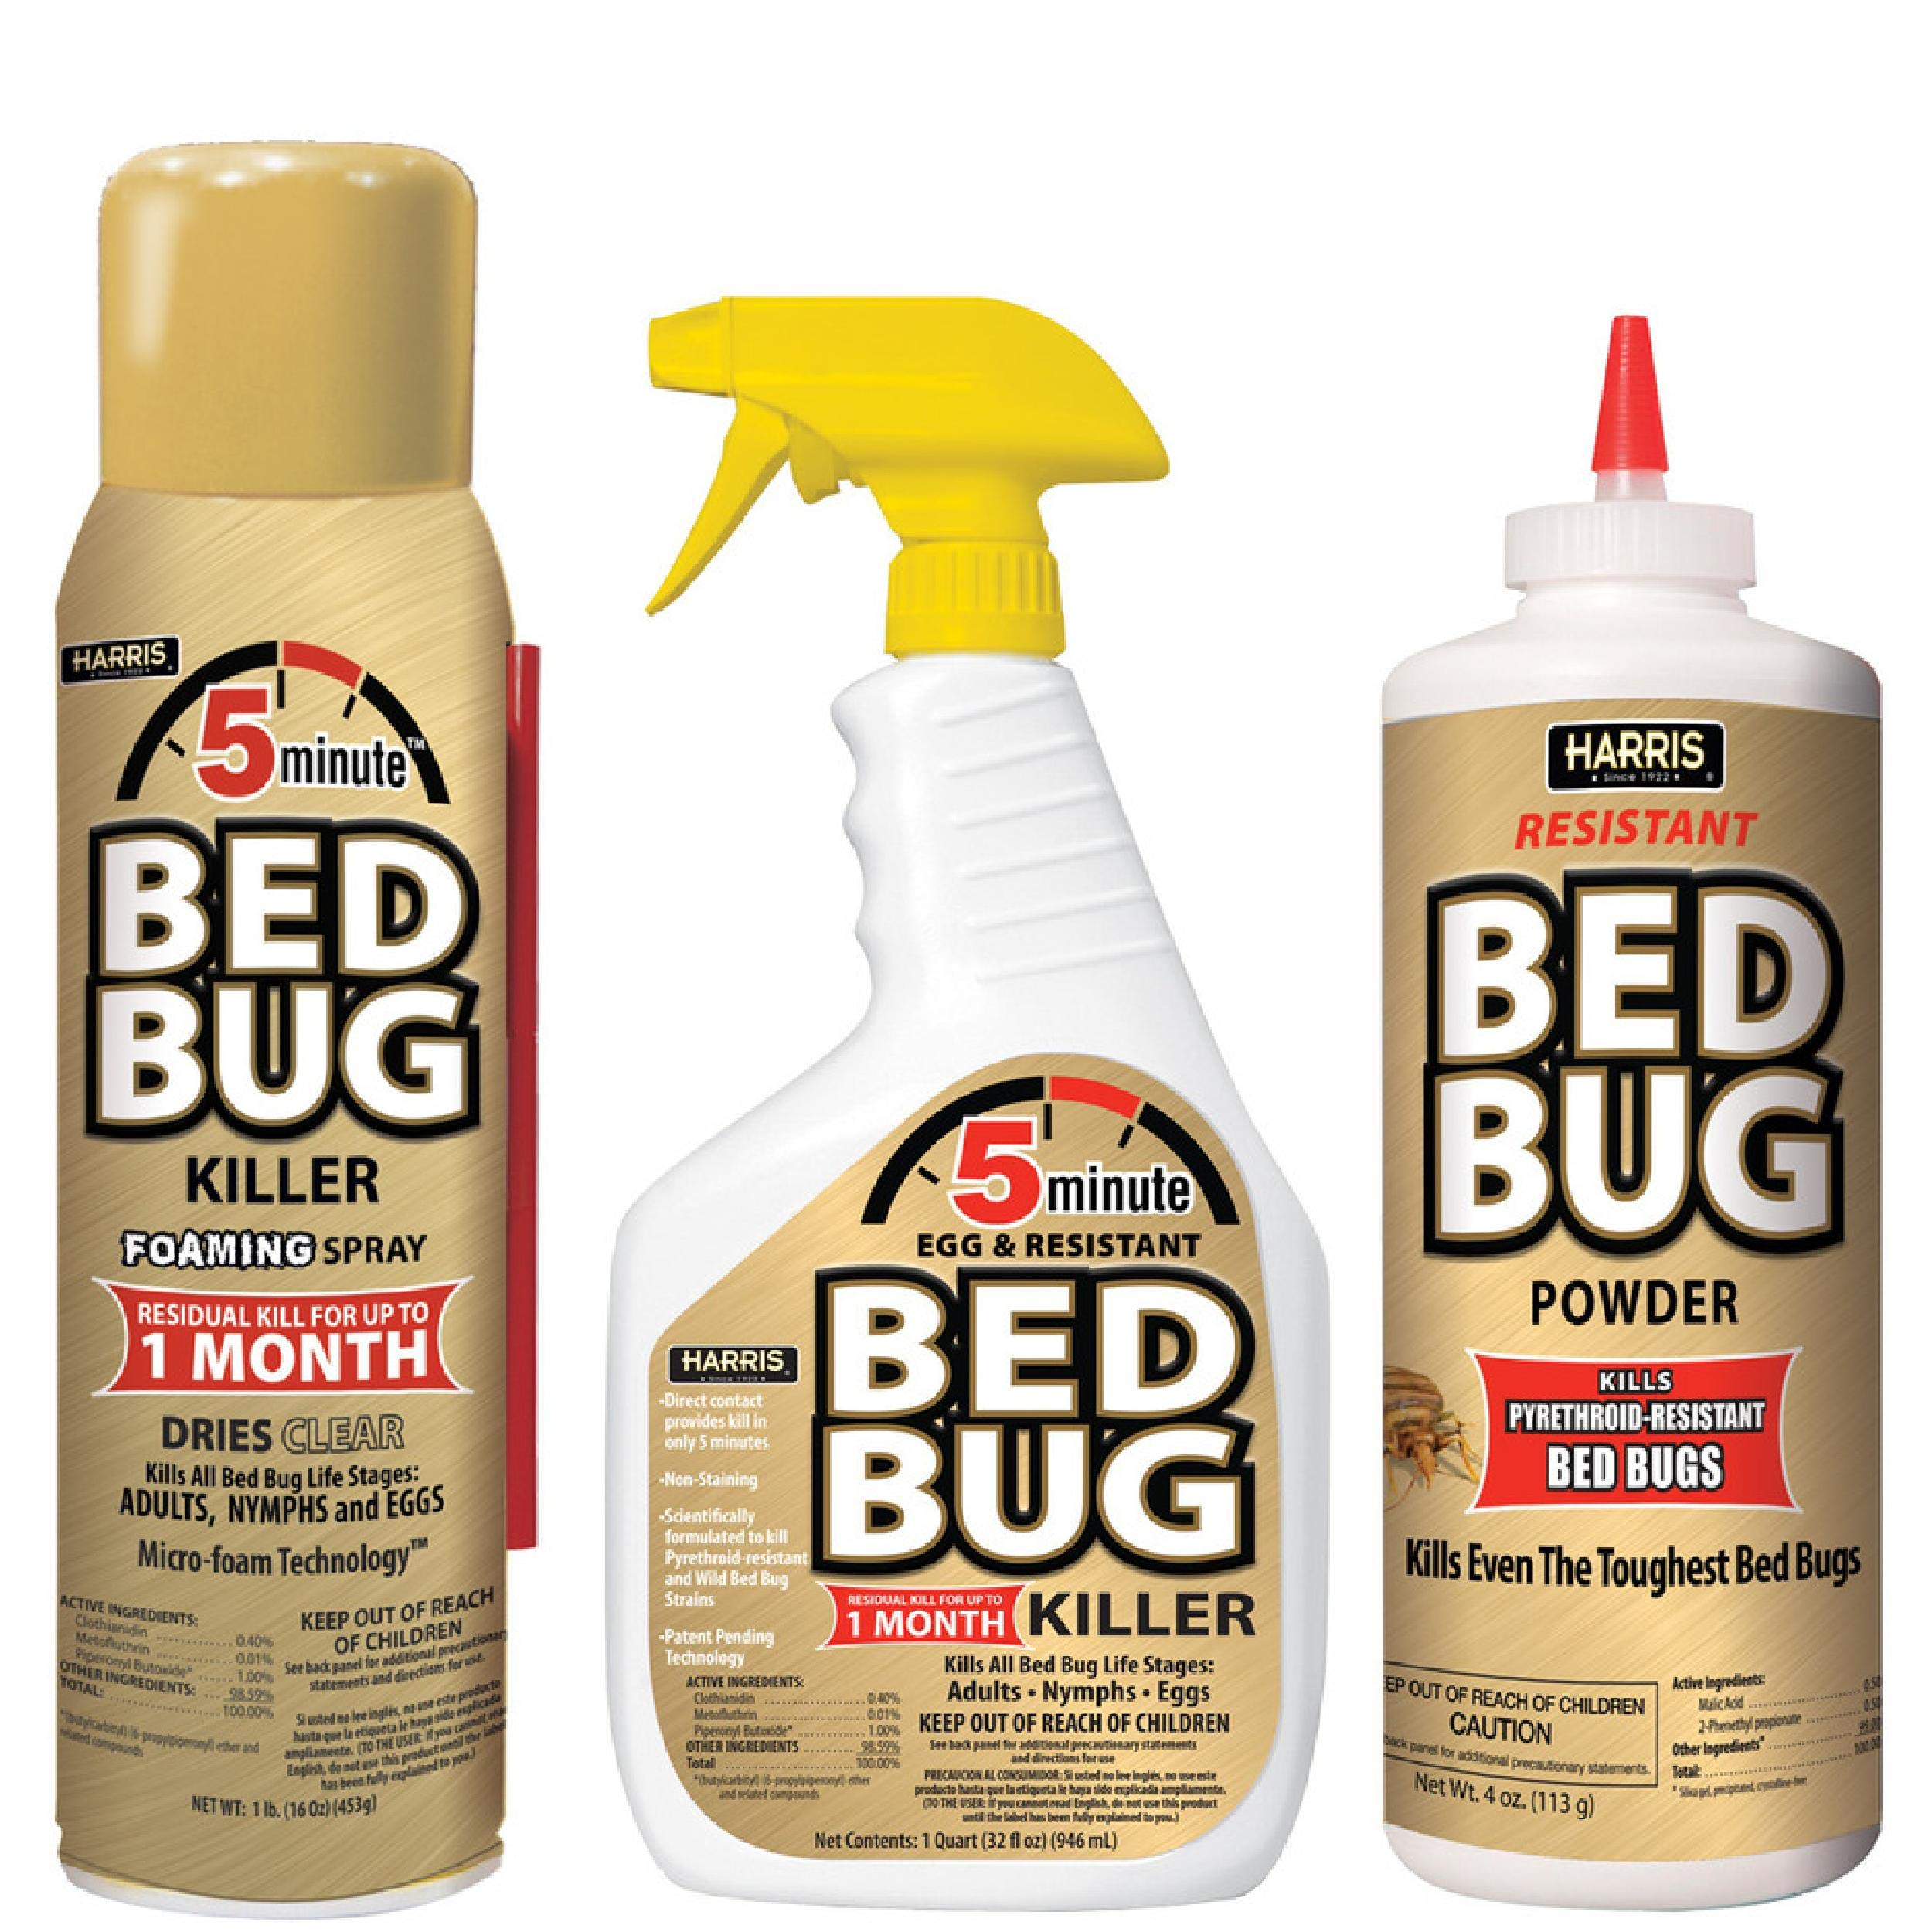 Harris 5 Minute Bed Bug Killer Value Bundle Kit - 32oz Liquid Spray, 16oz Foaming Aerosol, 8oz Bed Bug Powder by Harris